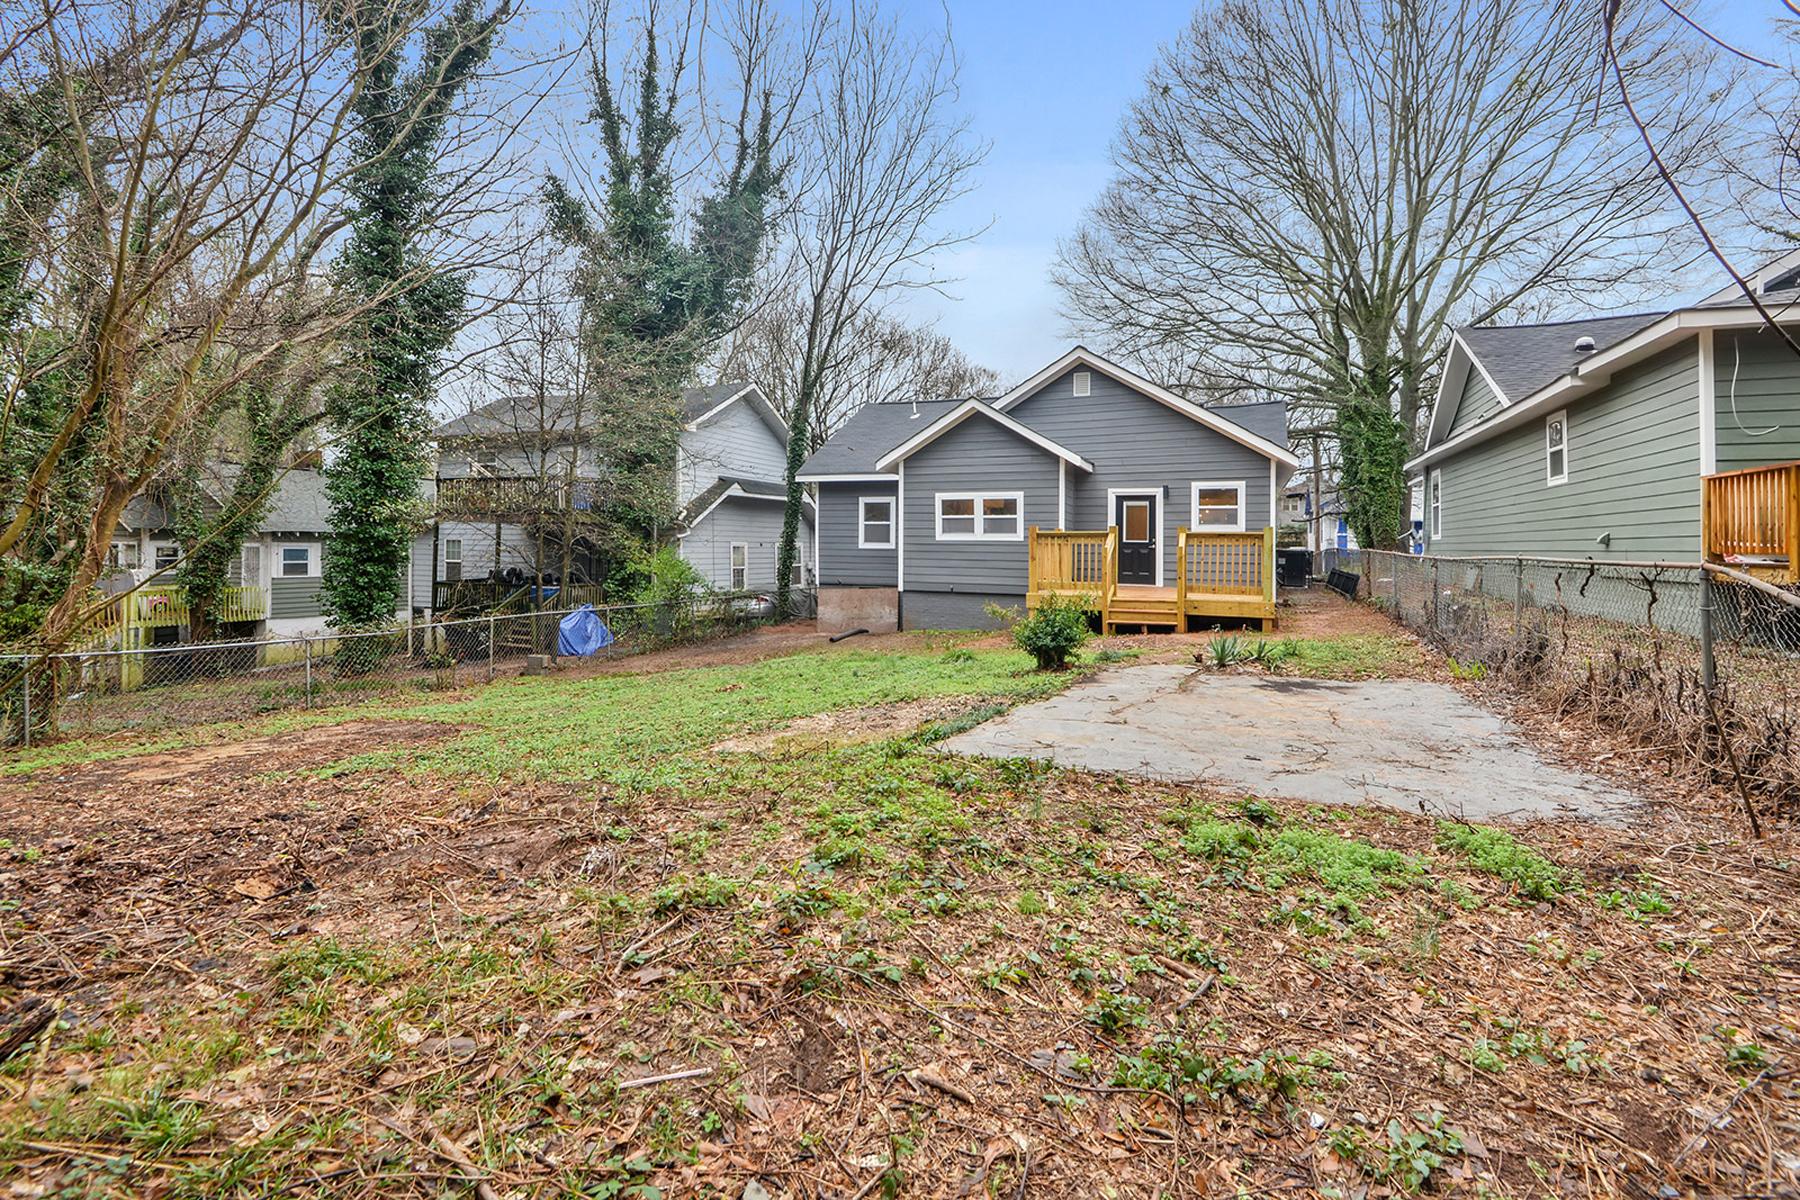 Additional photo for property listing at Beautifully Renovated West End Craftsman Bungalow 916 Gaston Street SW, Atlanta, Geórgia 30310 Estados Unidos